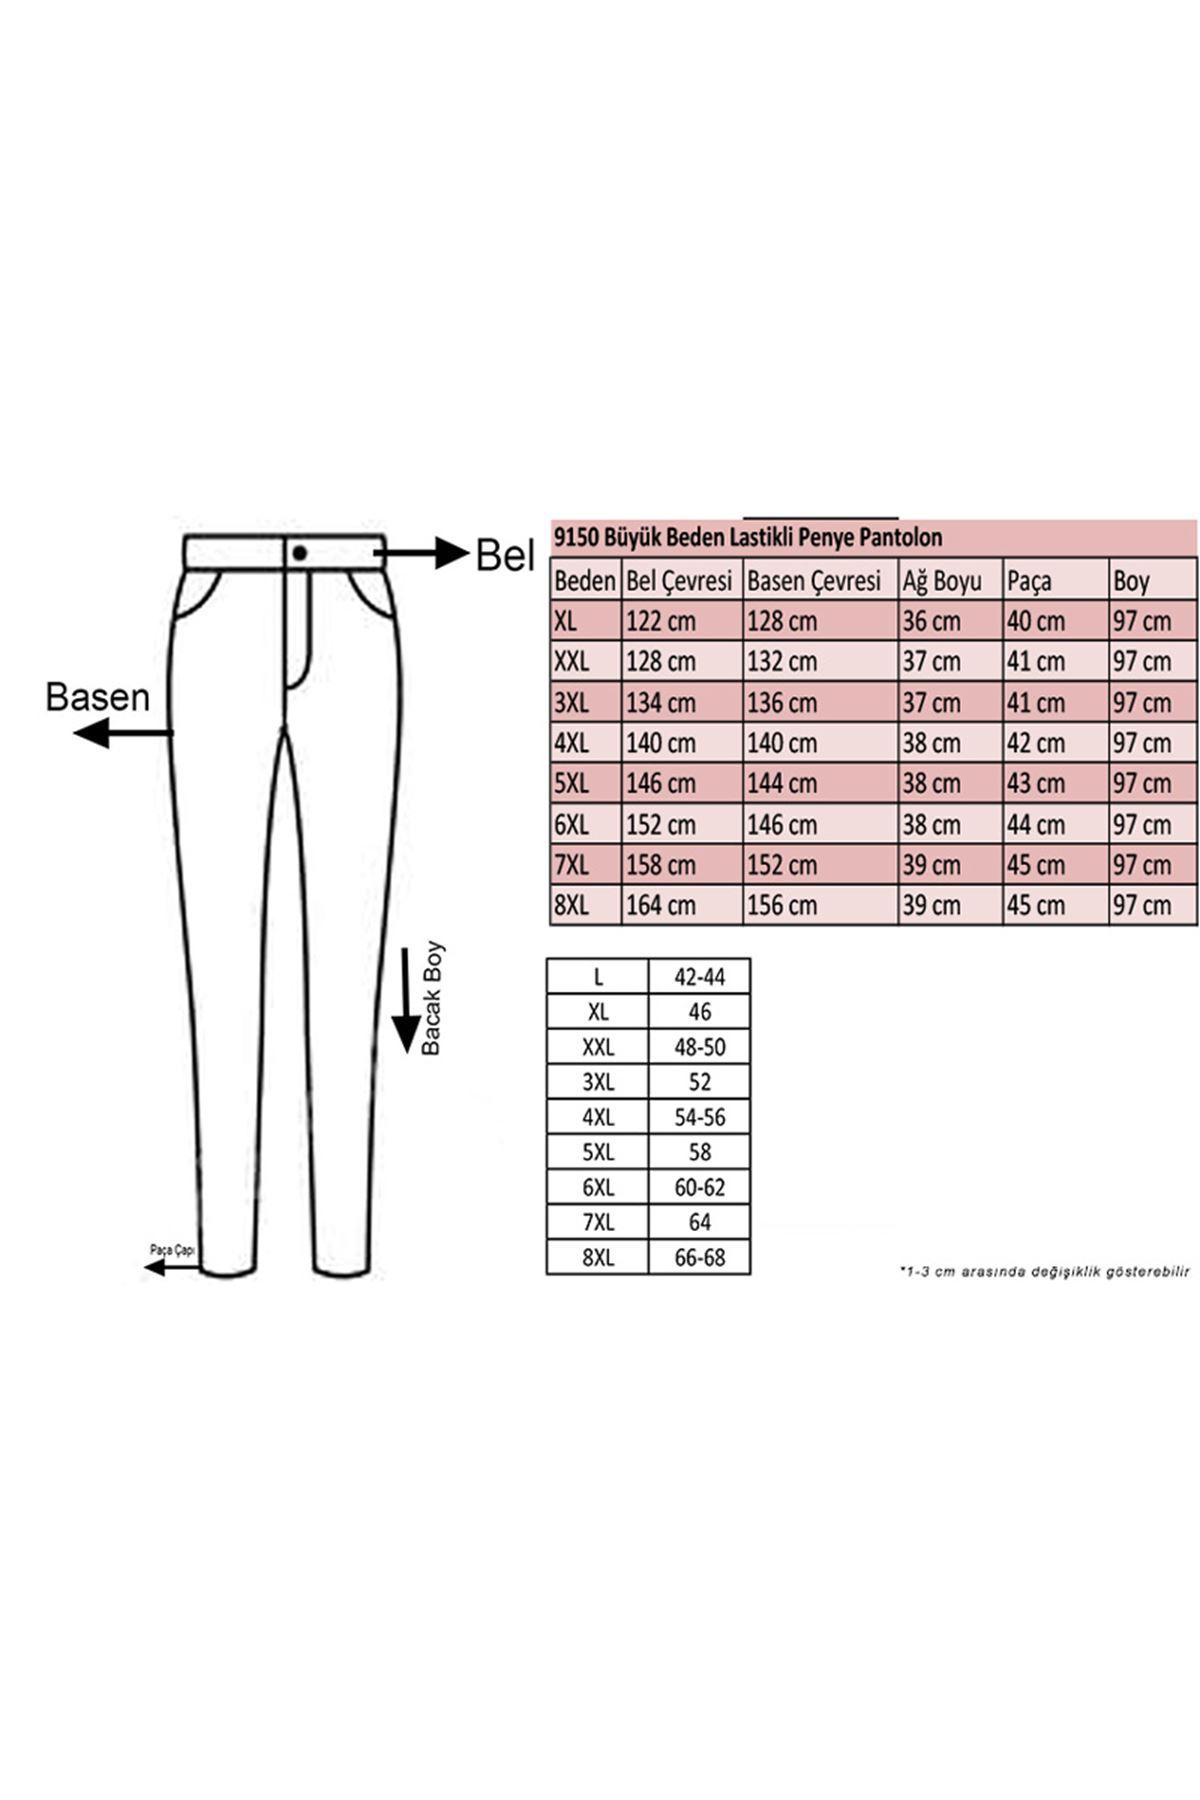 9150 Büyük Beden Lastikli Penye Pantolon - Mor